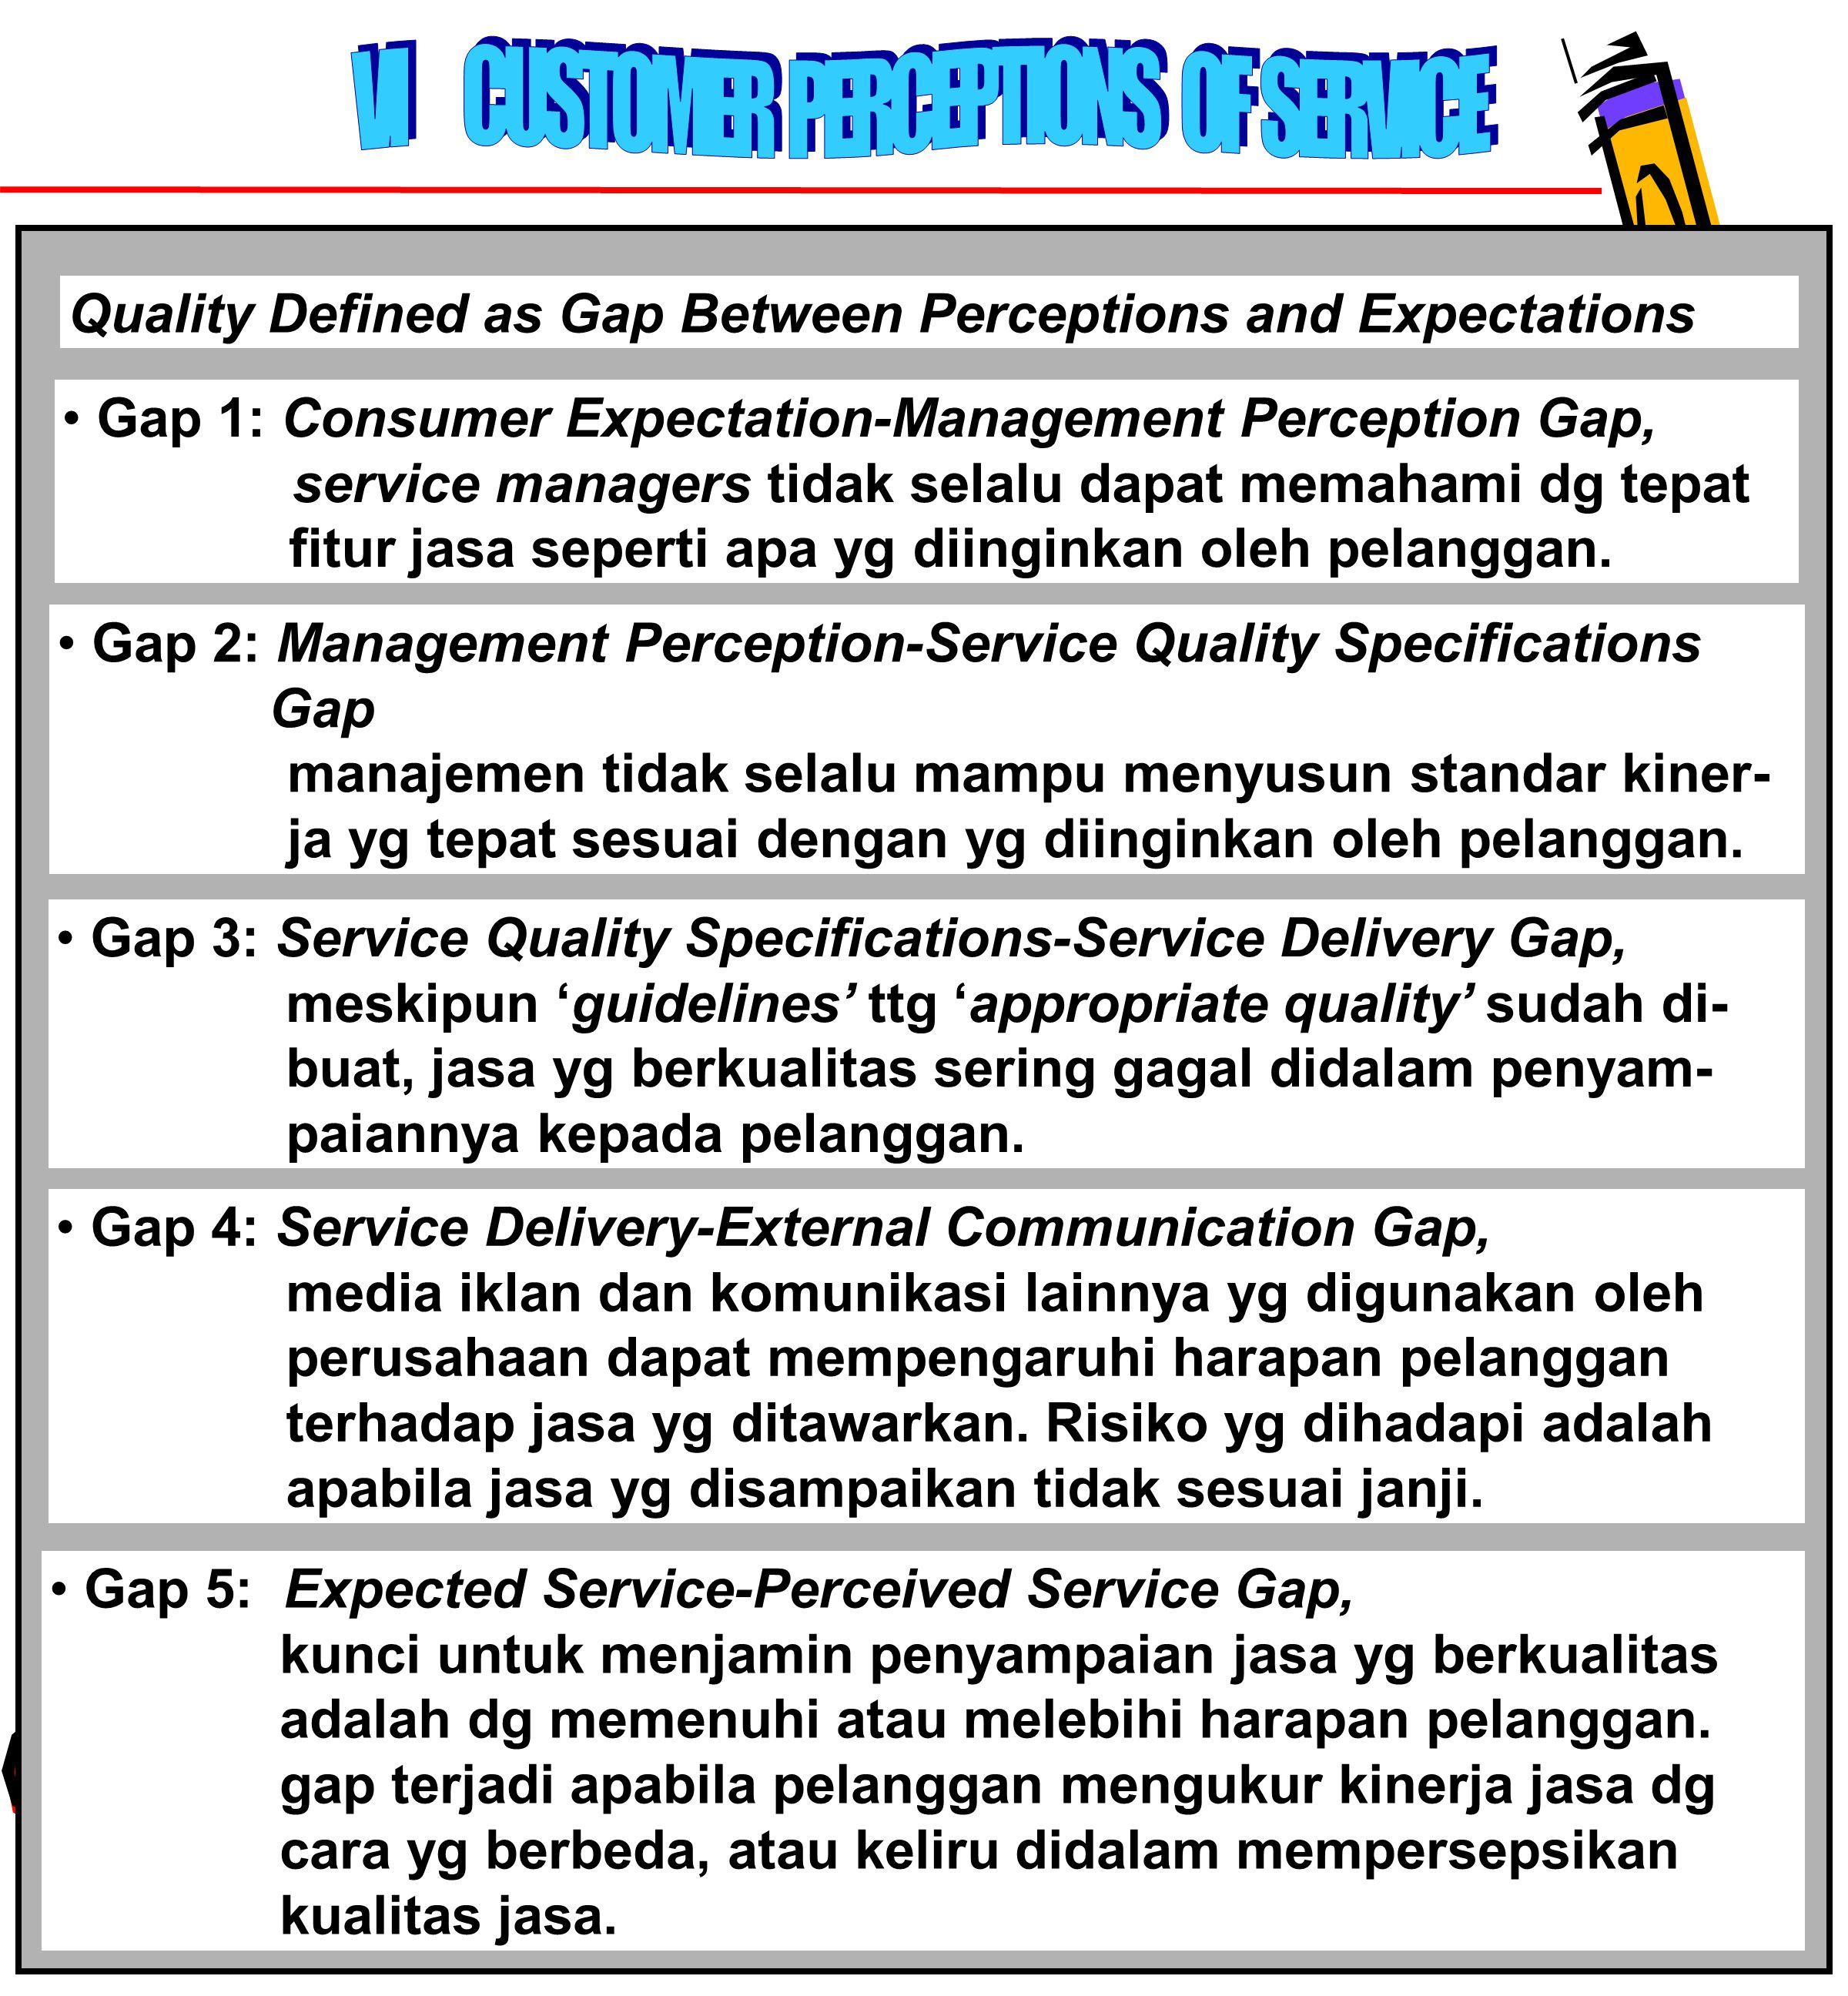 78 Quality Defined as Gap Between Perceptions and Expectations Gap 1: Consumer Expectation-Management Perception Gap, service managers tidak selalu dapat memahami dg tepat fitur jasa seperti apa yg diinginkan oleh pelanggan.